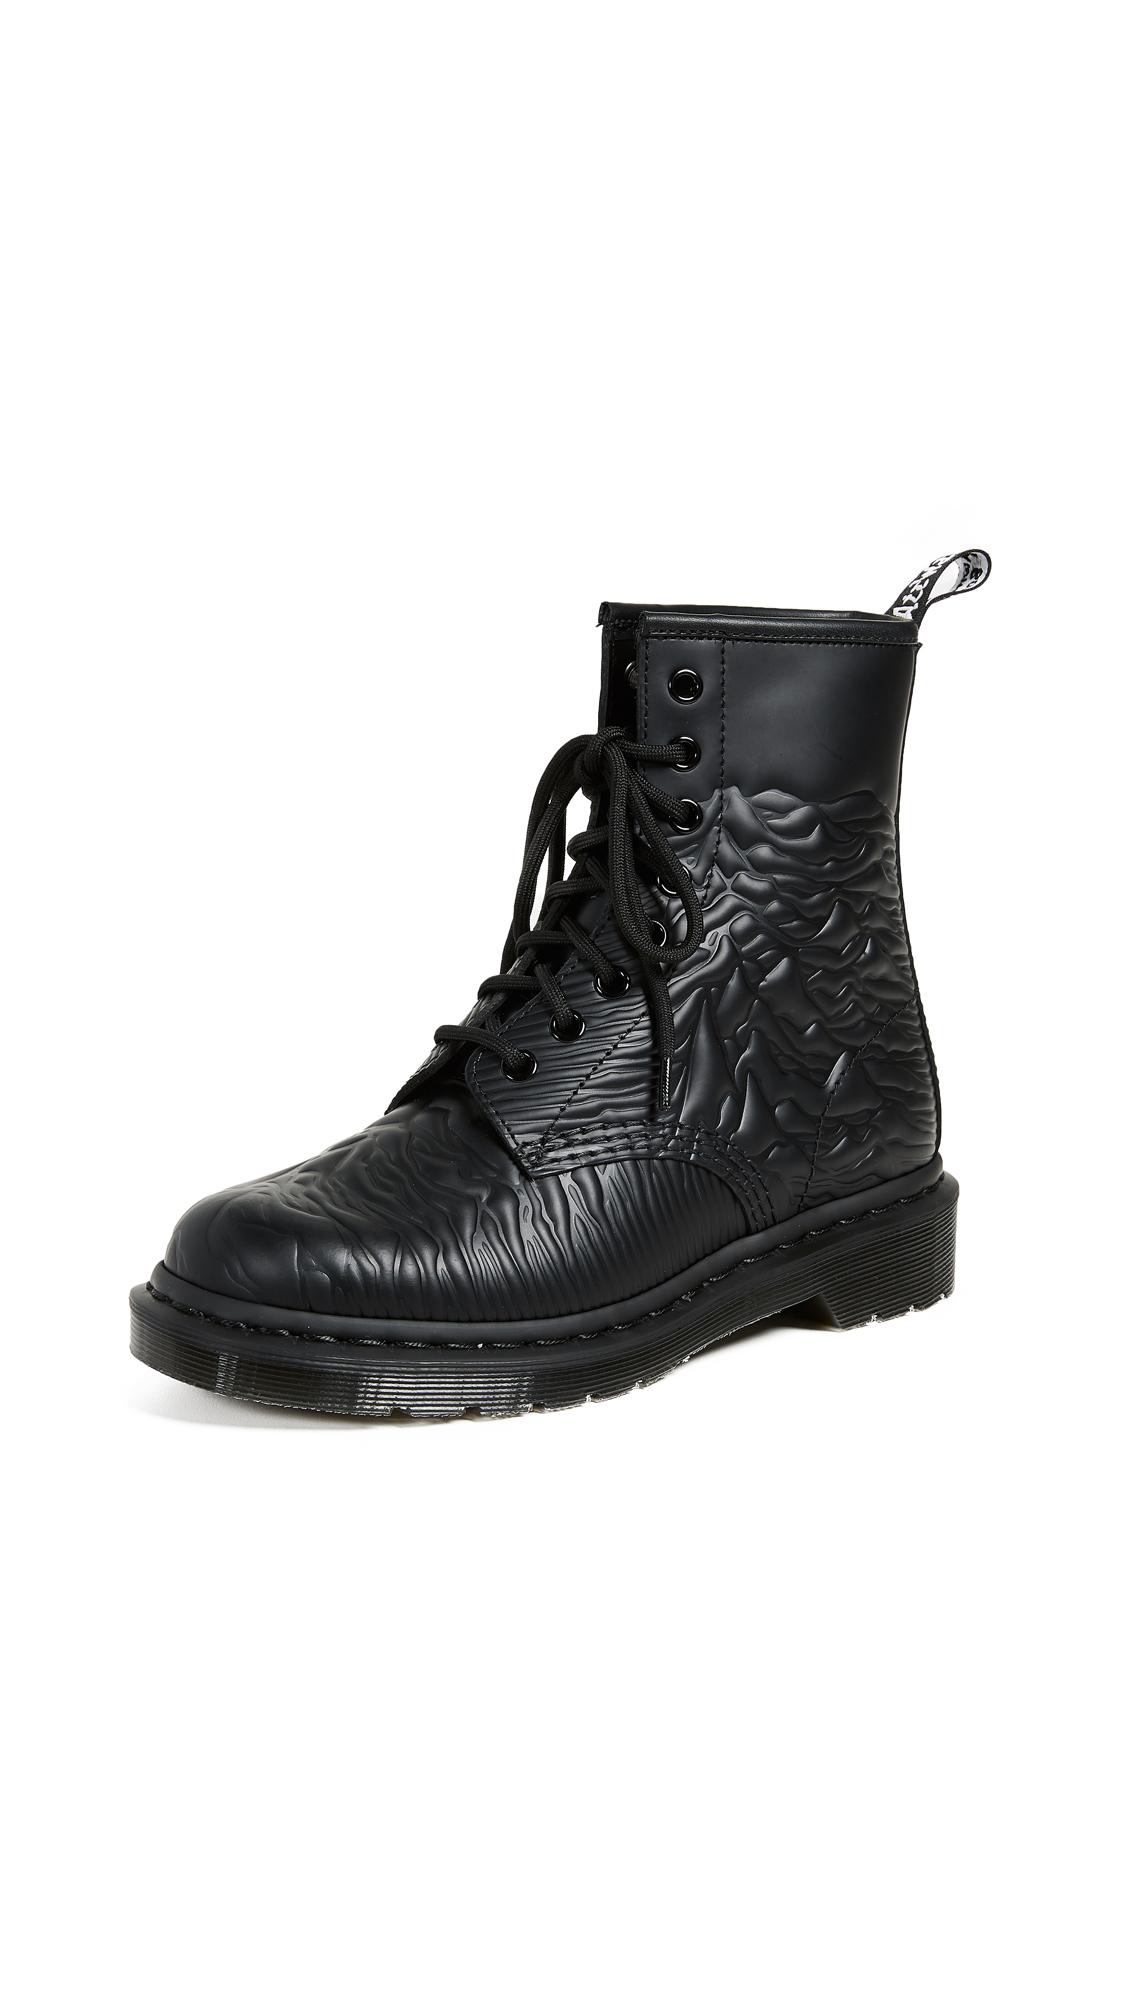 Dr. Martens x Joy Division 1460 Emboss 8 Eye Boots - Black